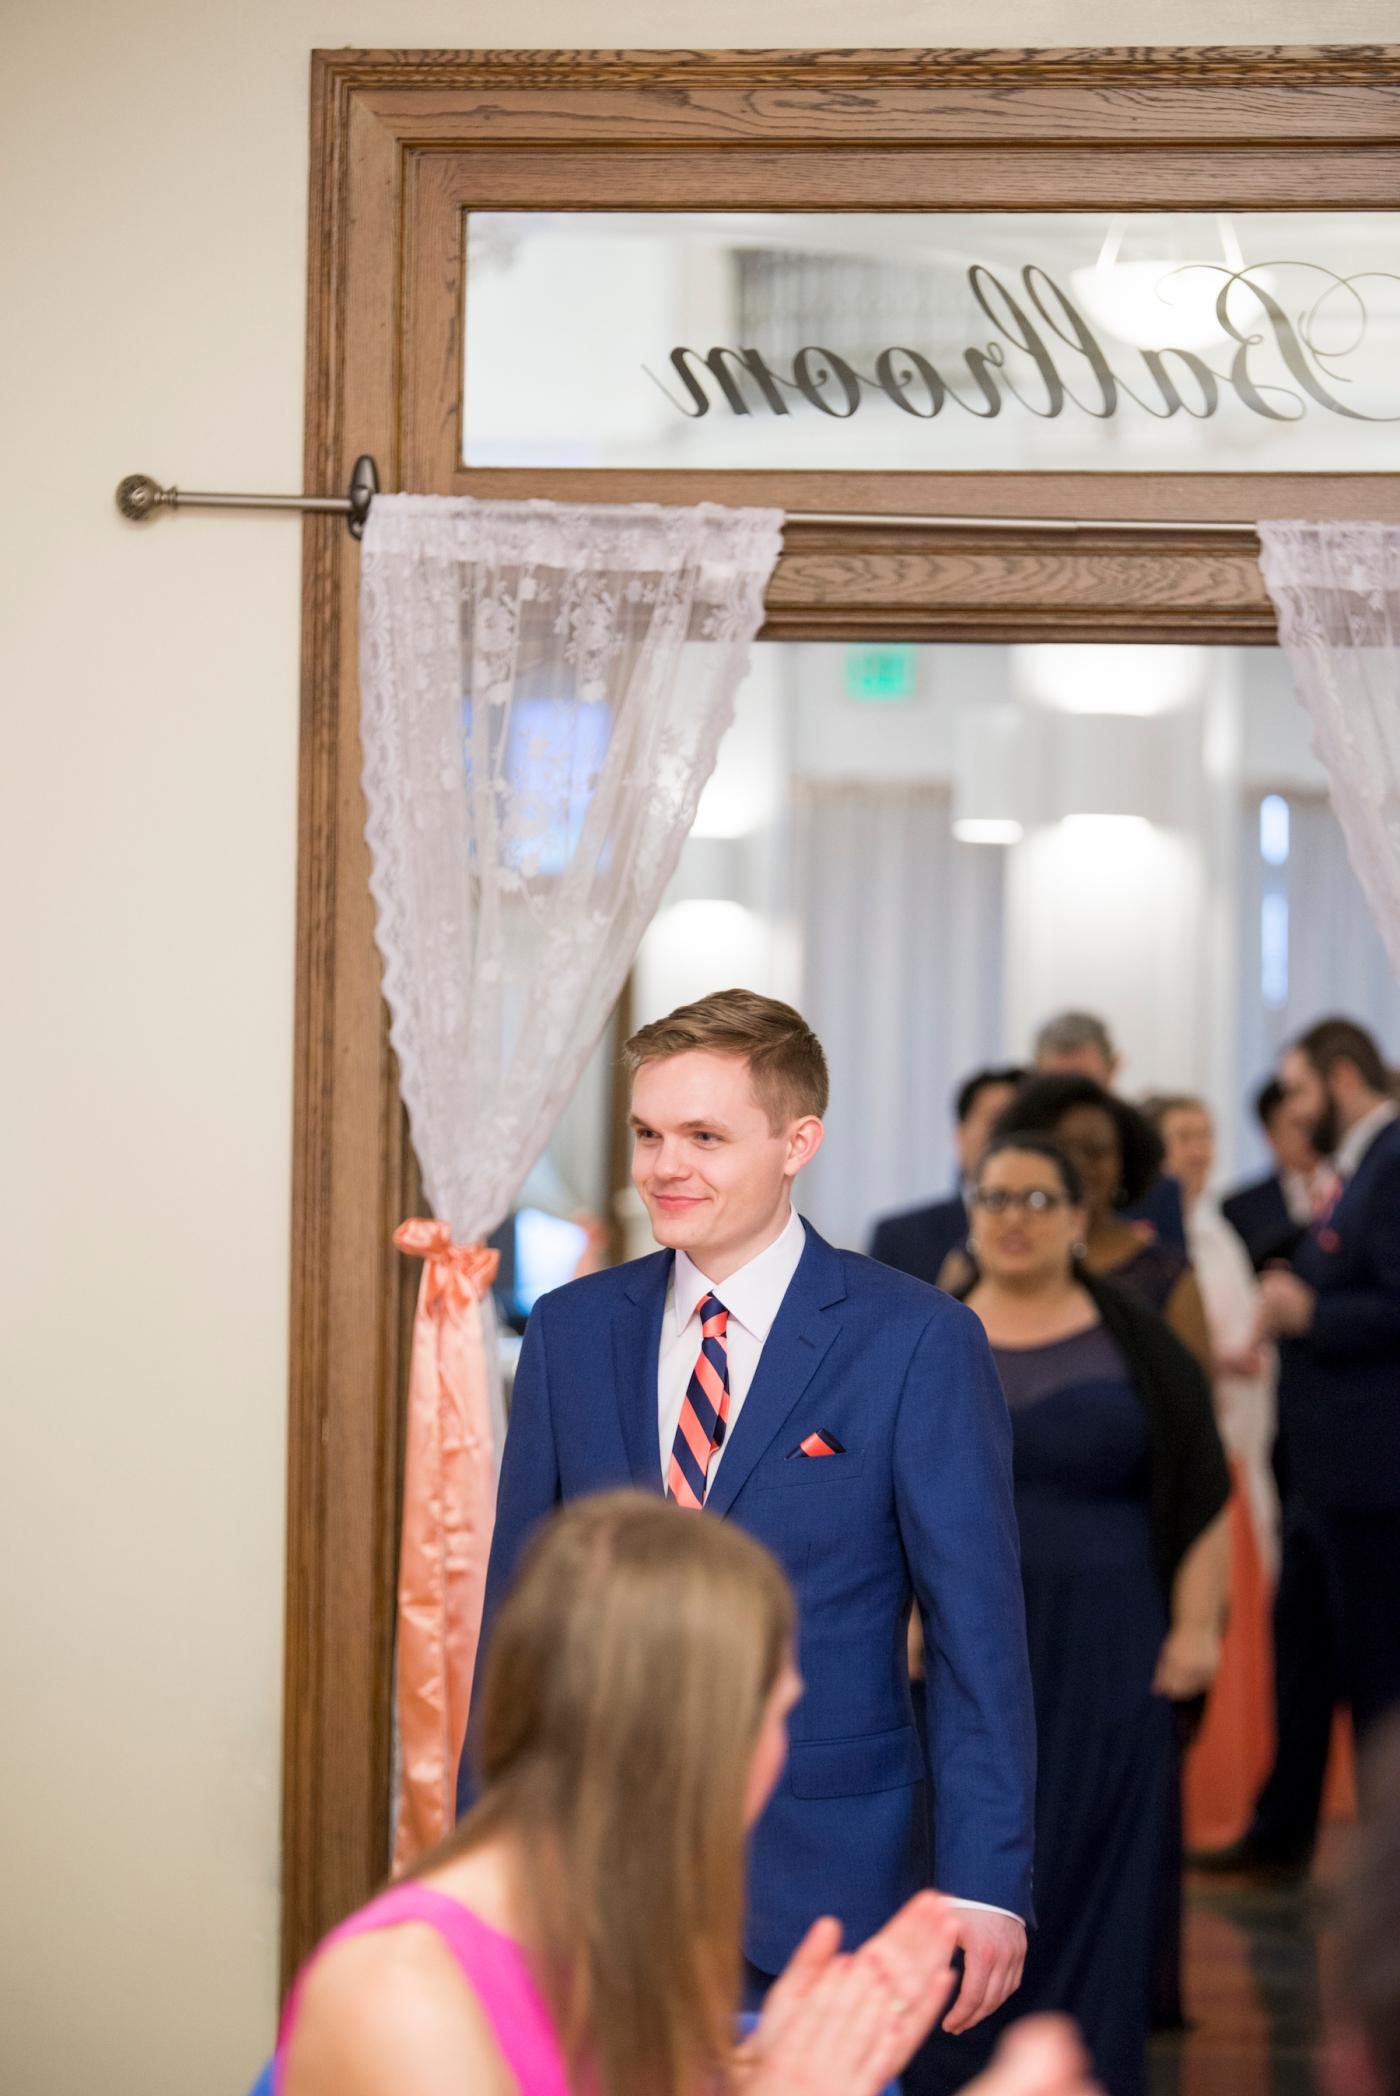 DSC_3118Everett_Wedding_Ballroom_Jane_Speleers_photography_Rachel_and_Edmund_reception_2017